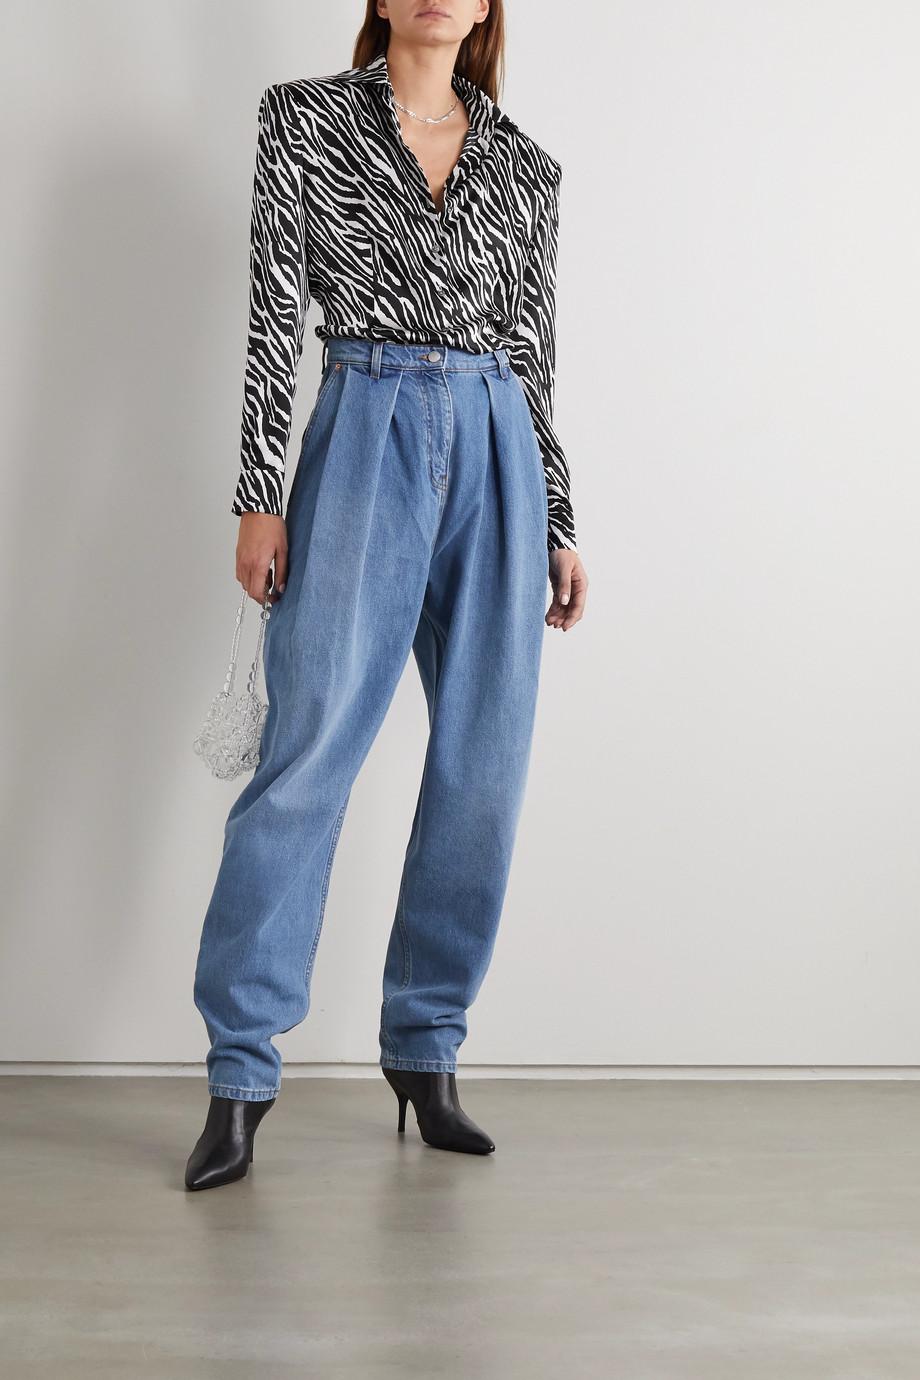 Magda Butrym Zebra-print silk-satin shirt